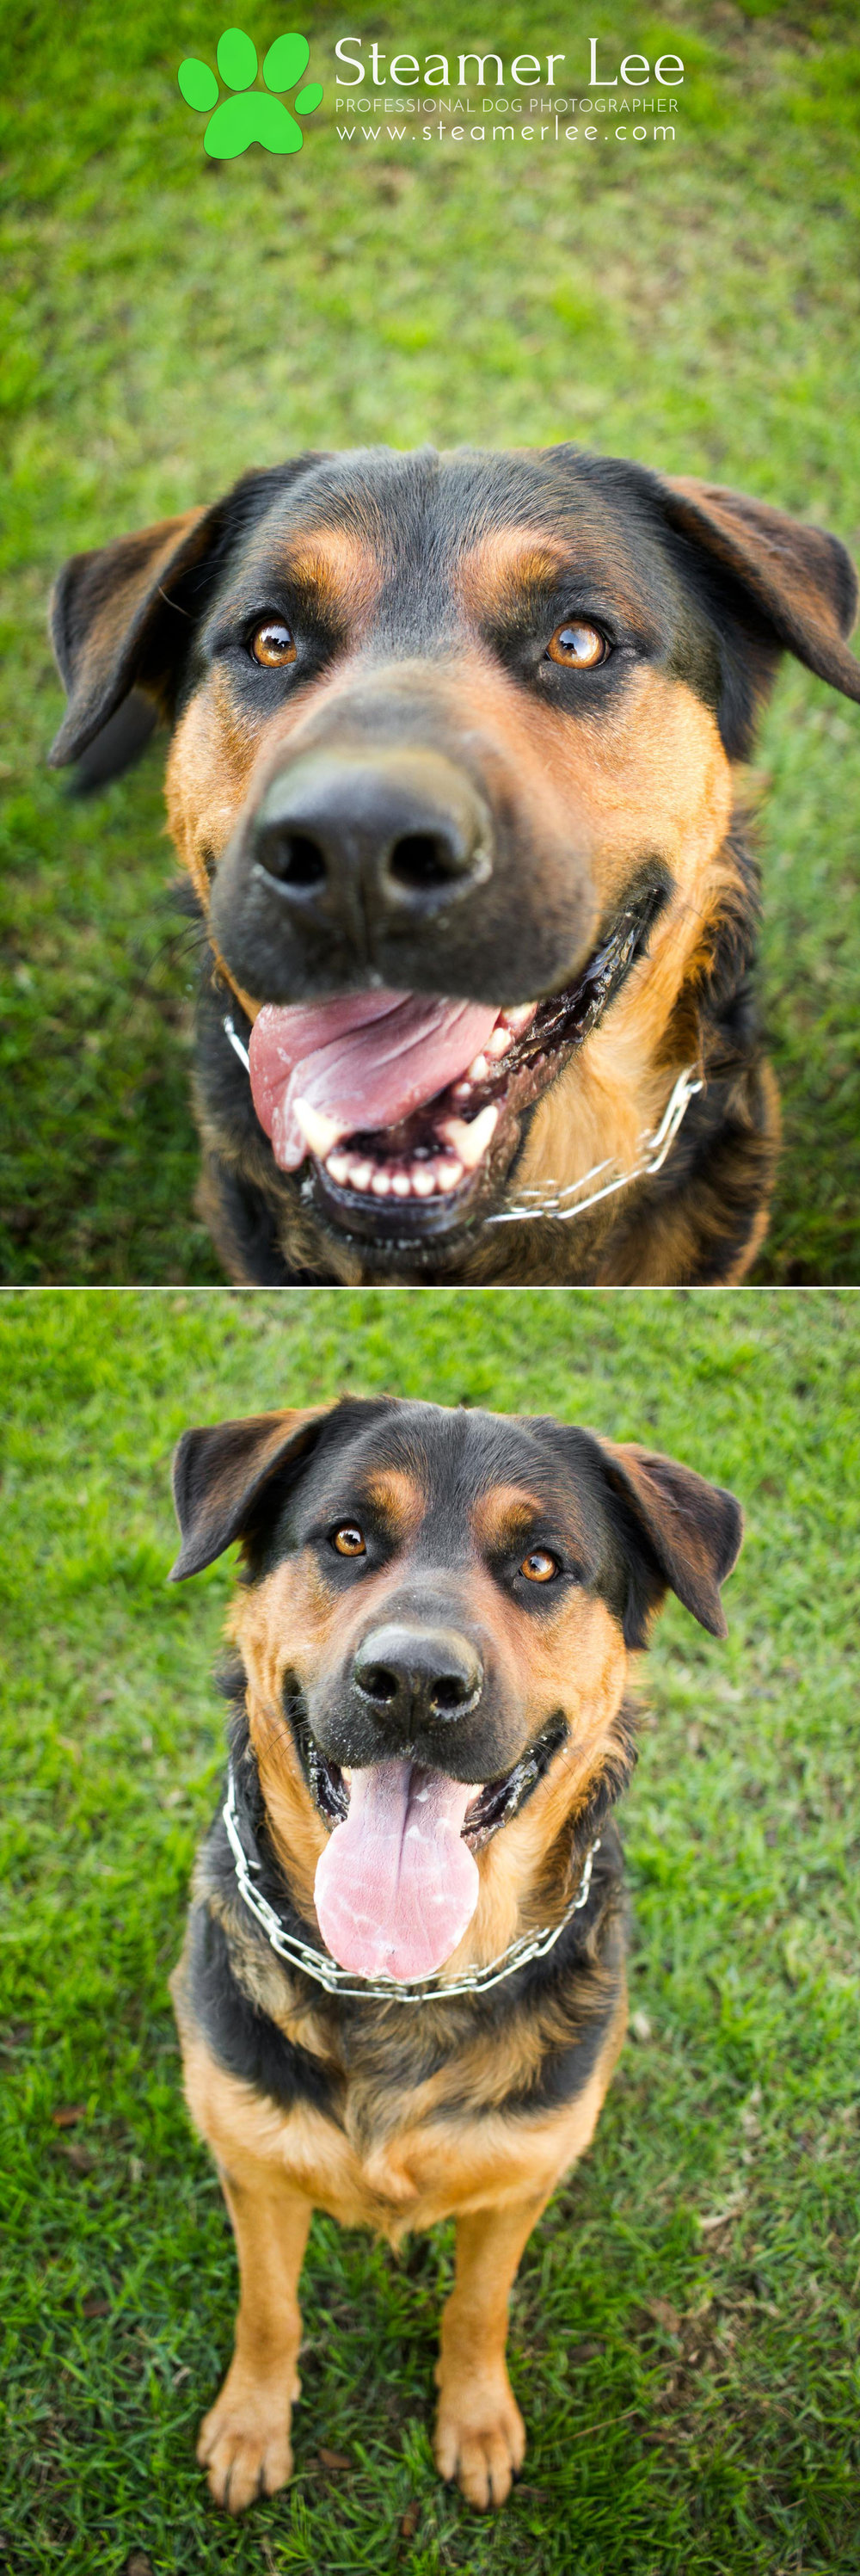 002 Steamer Lee Dog Photography - Orange County Dog Photography - German Shepherd Rottweiler Mix_Poodle.JPG